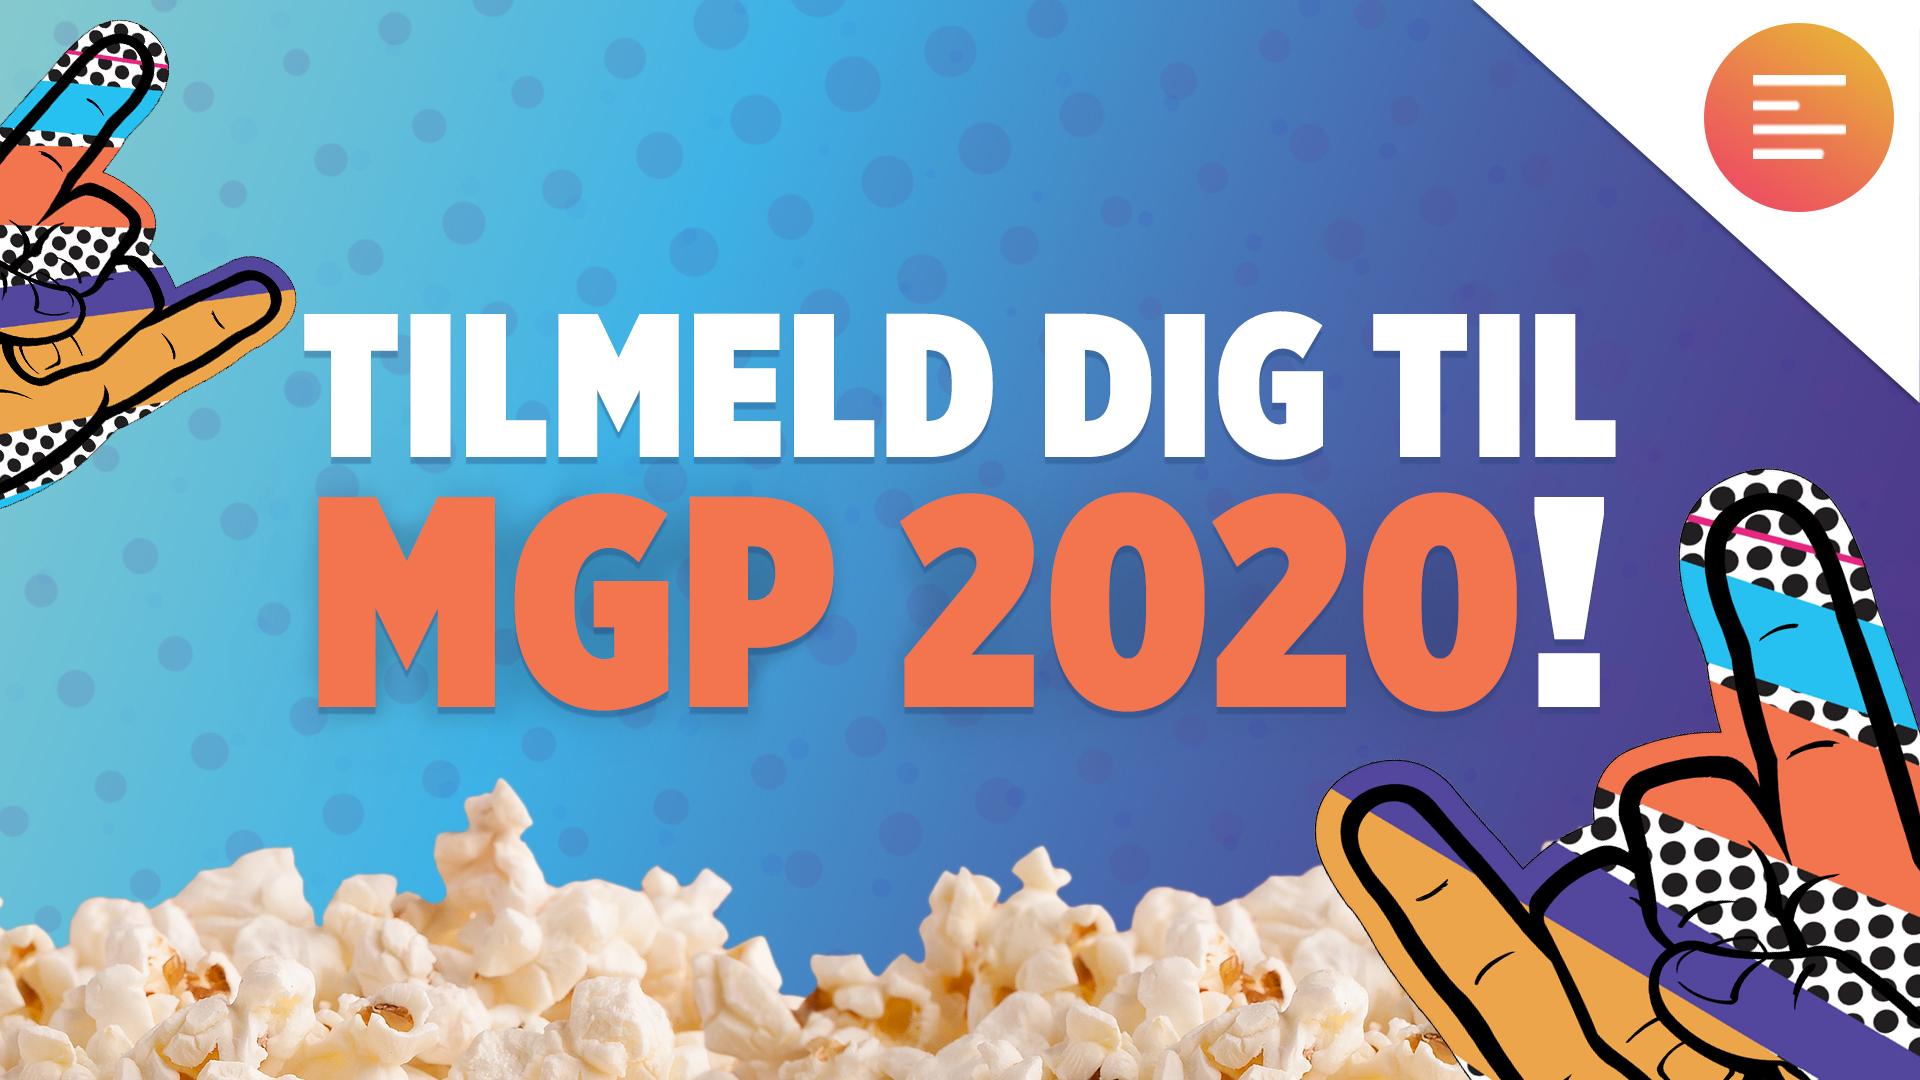 tilmeld-dig-til-mgp-2020-spot.jpg